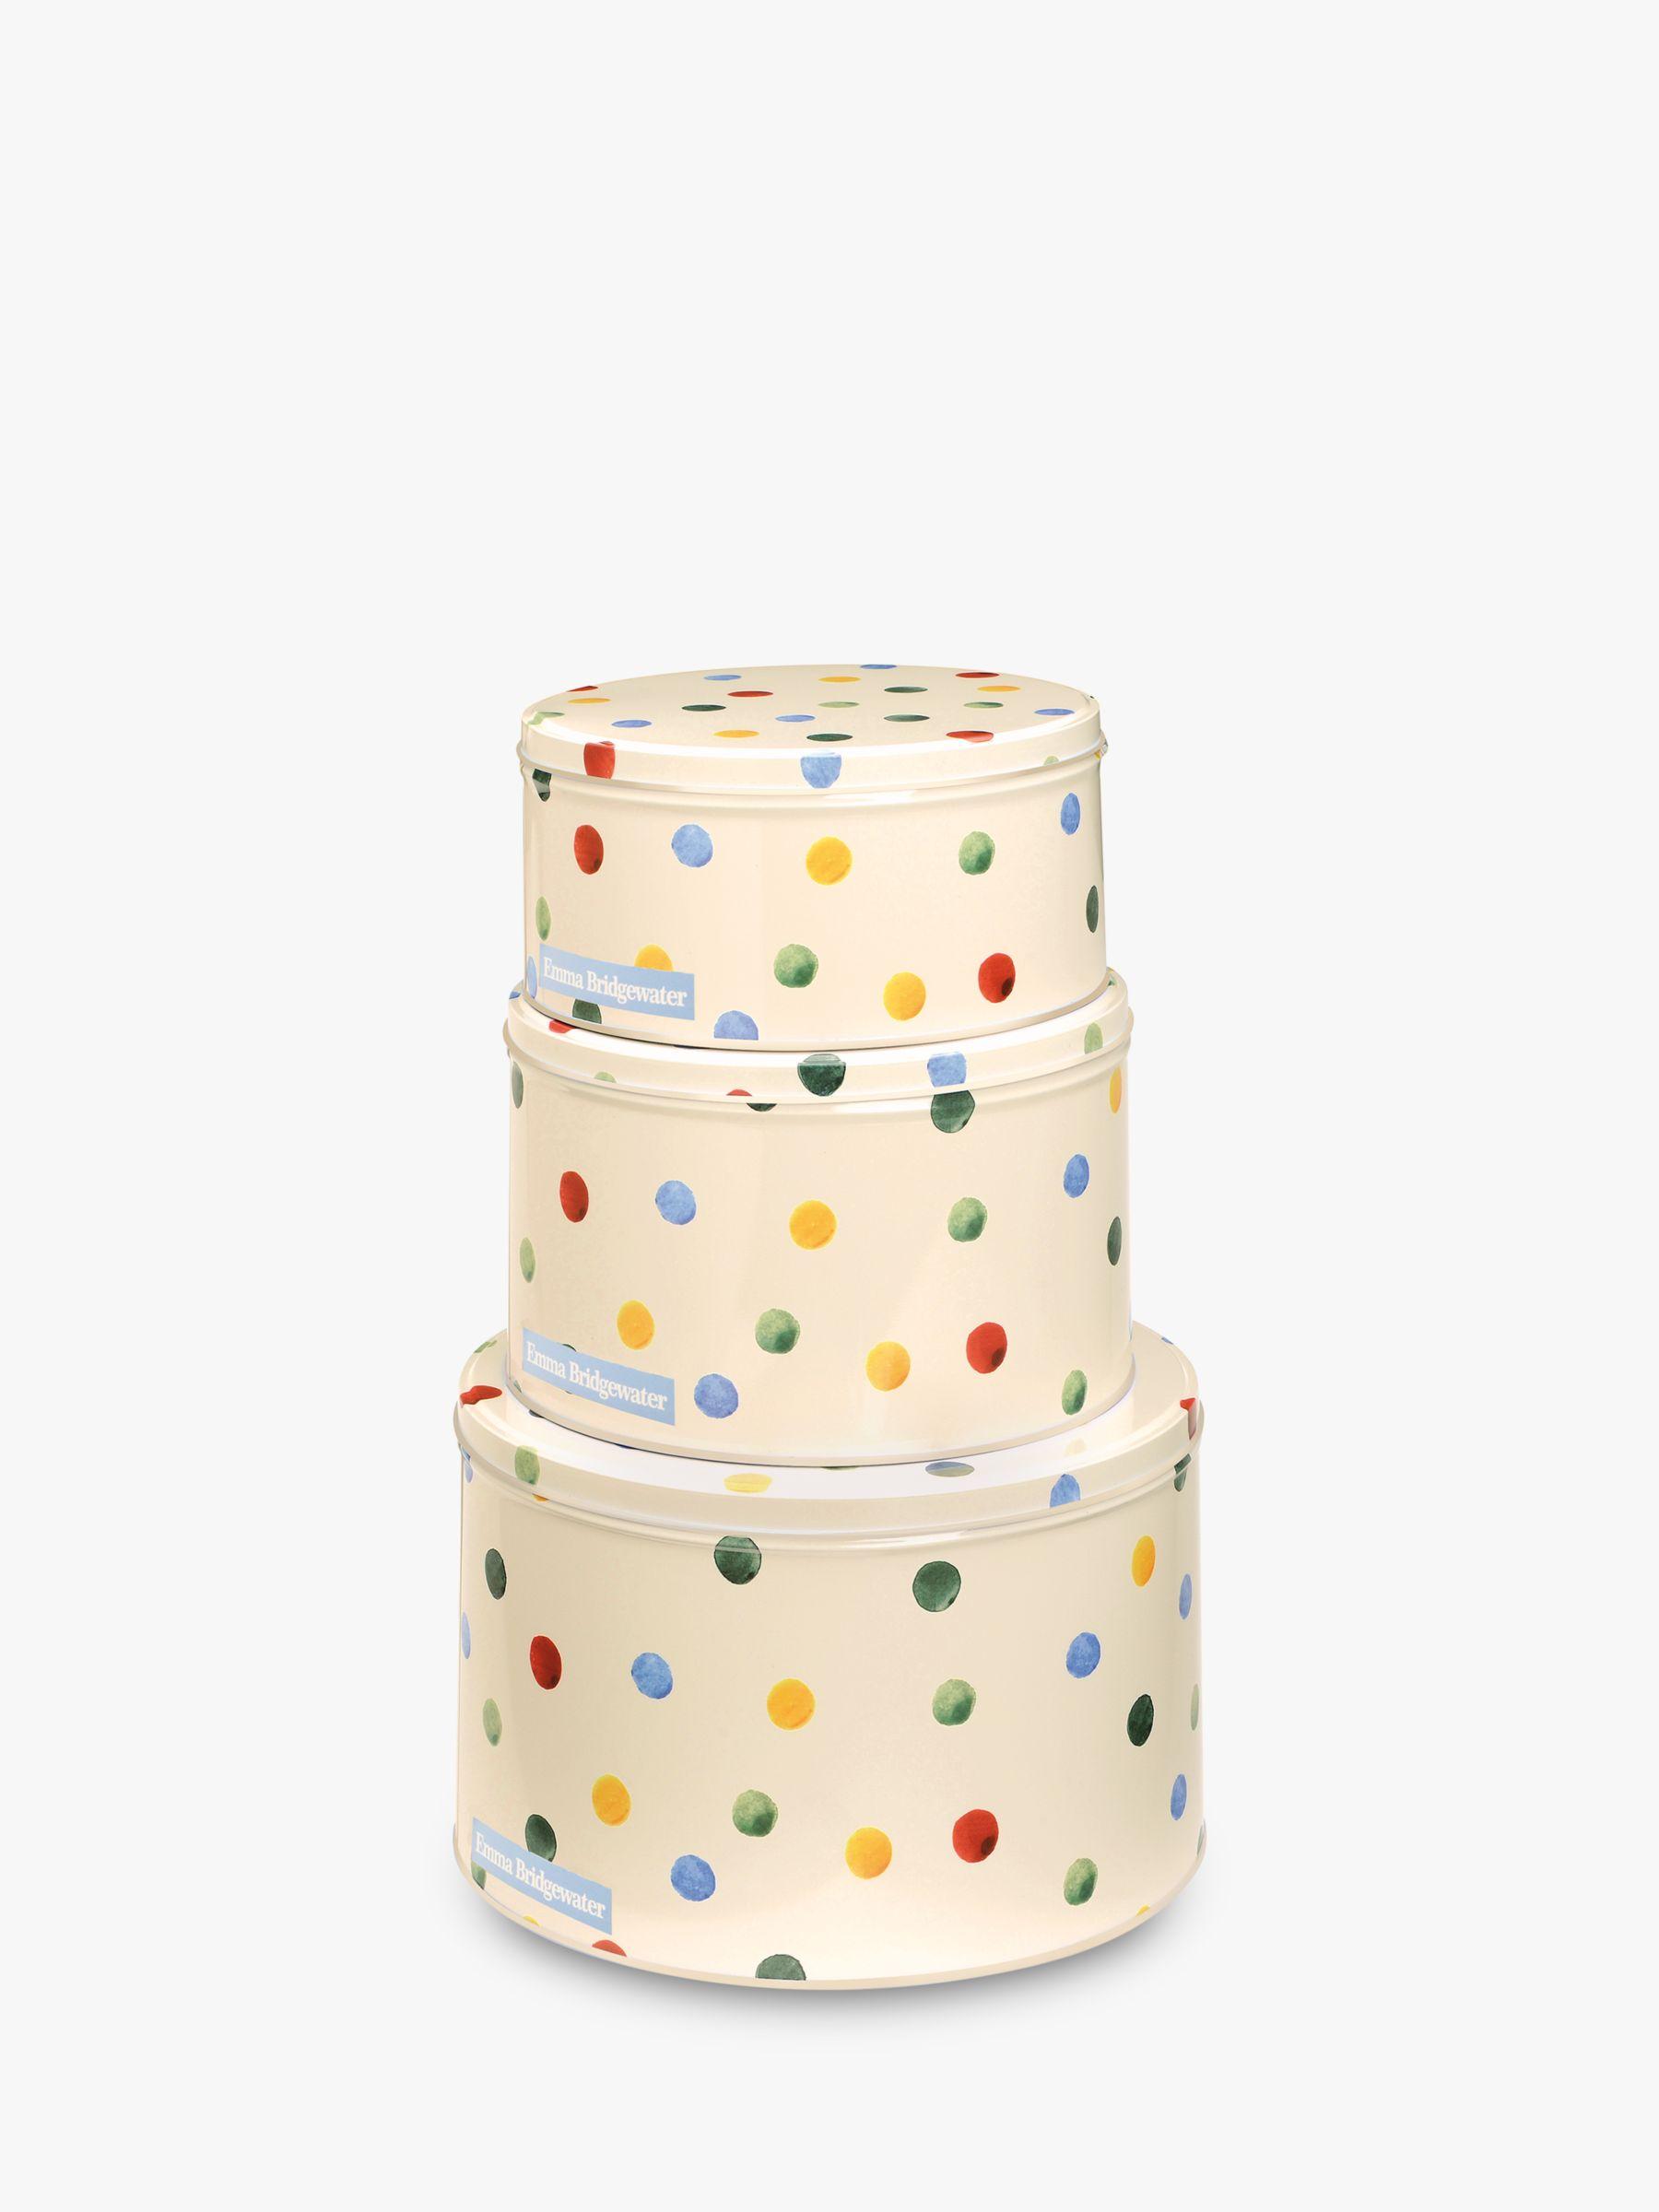 Emma Bridgewater Polka Dot Nesting Cake Tins, Set of 3, Cream/Multi